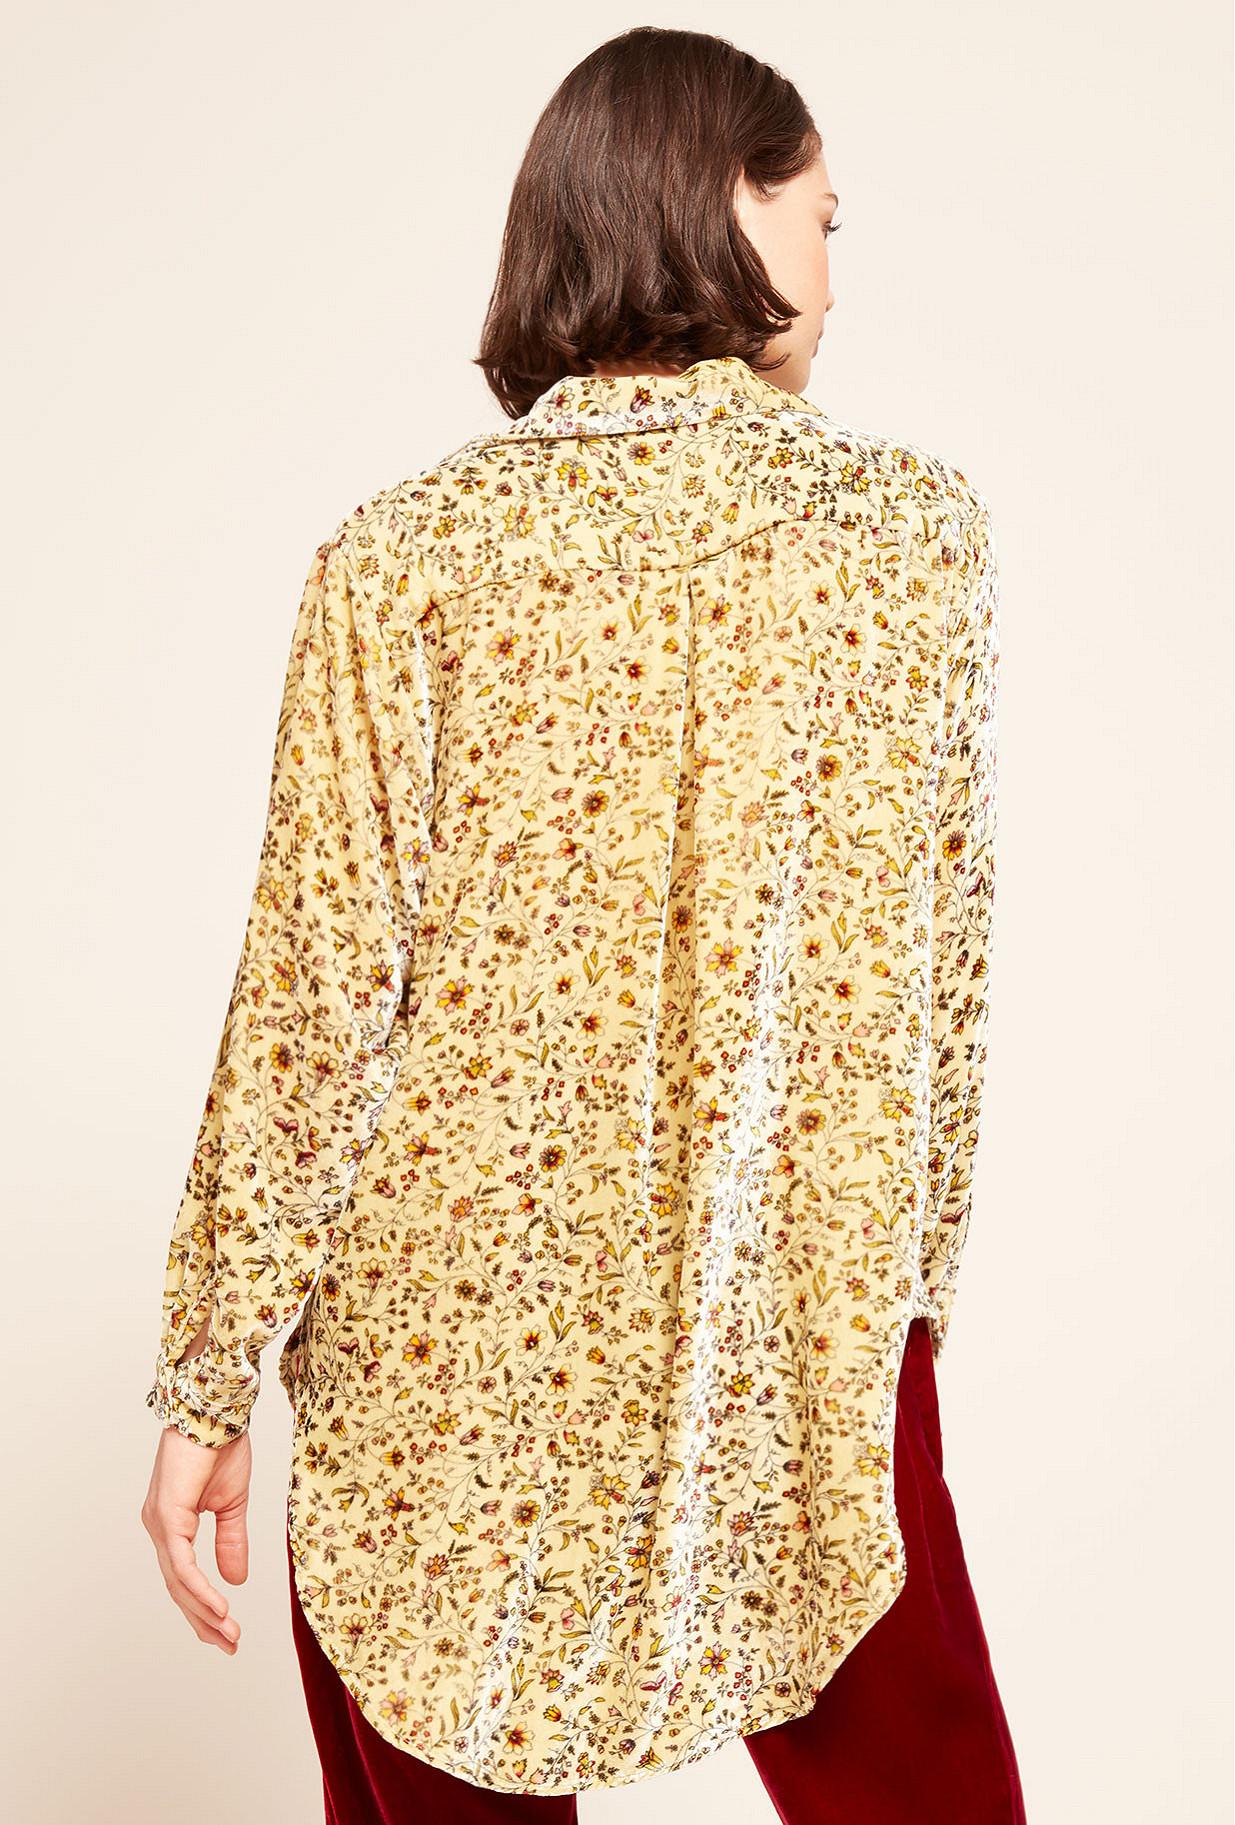 Floral print  Shirt  Zinnia Mes demoiselles fashion clothes designer Paris